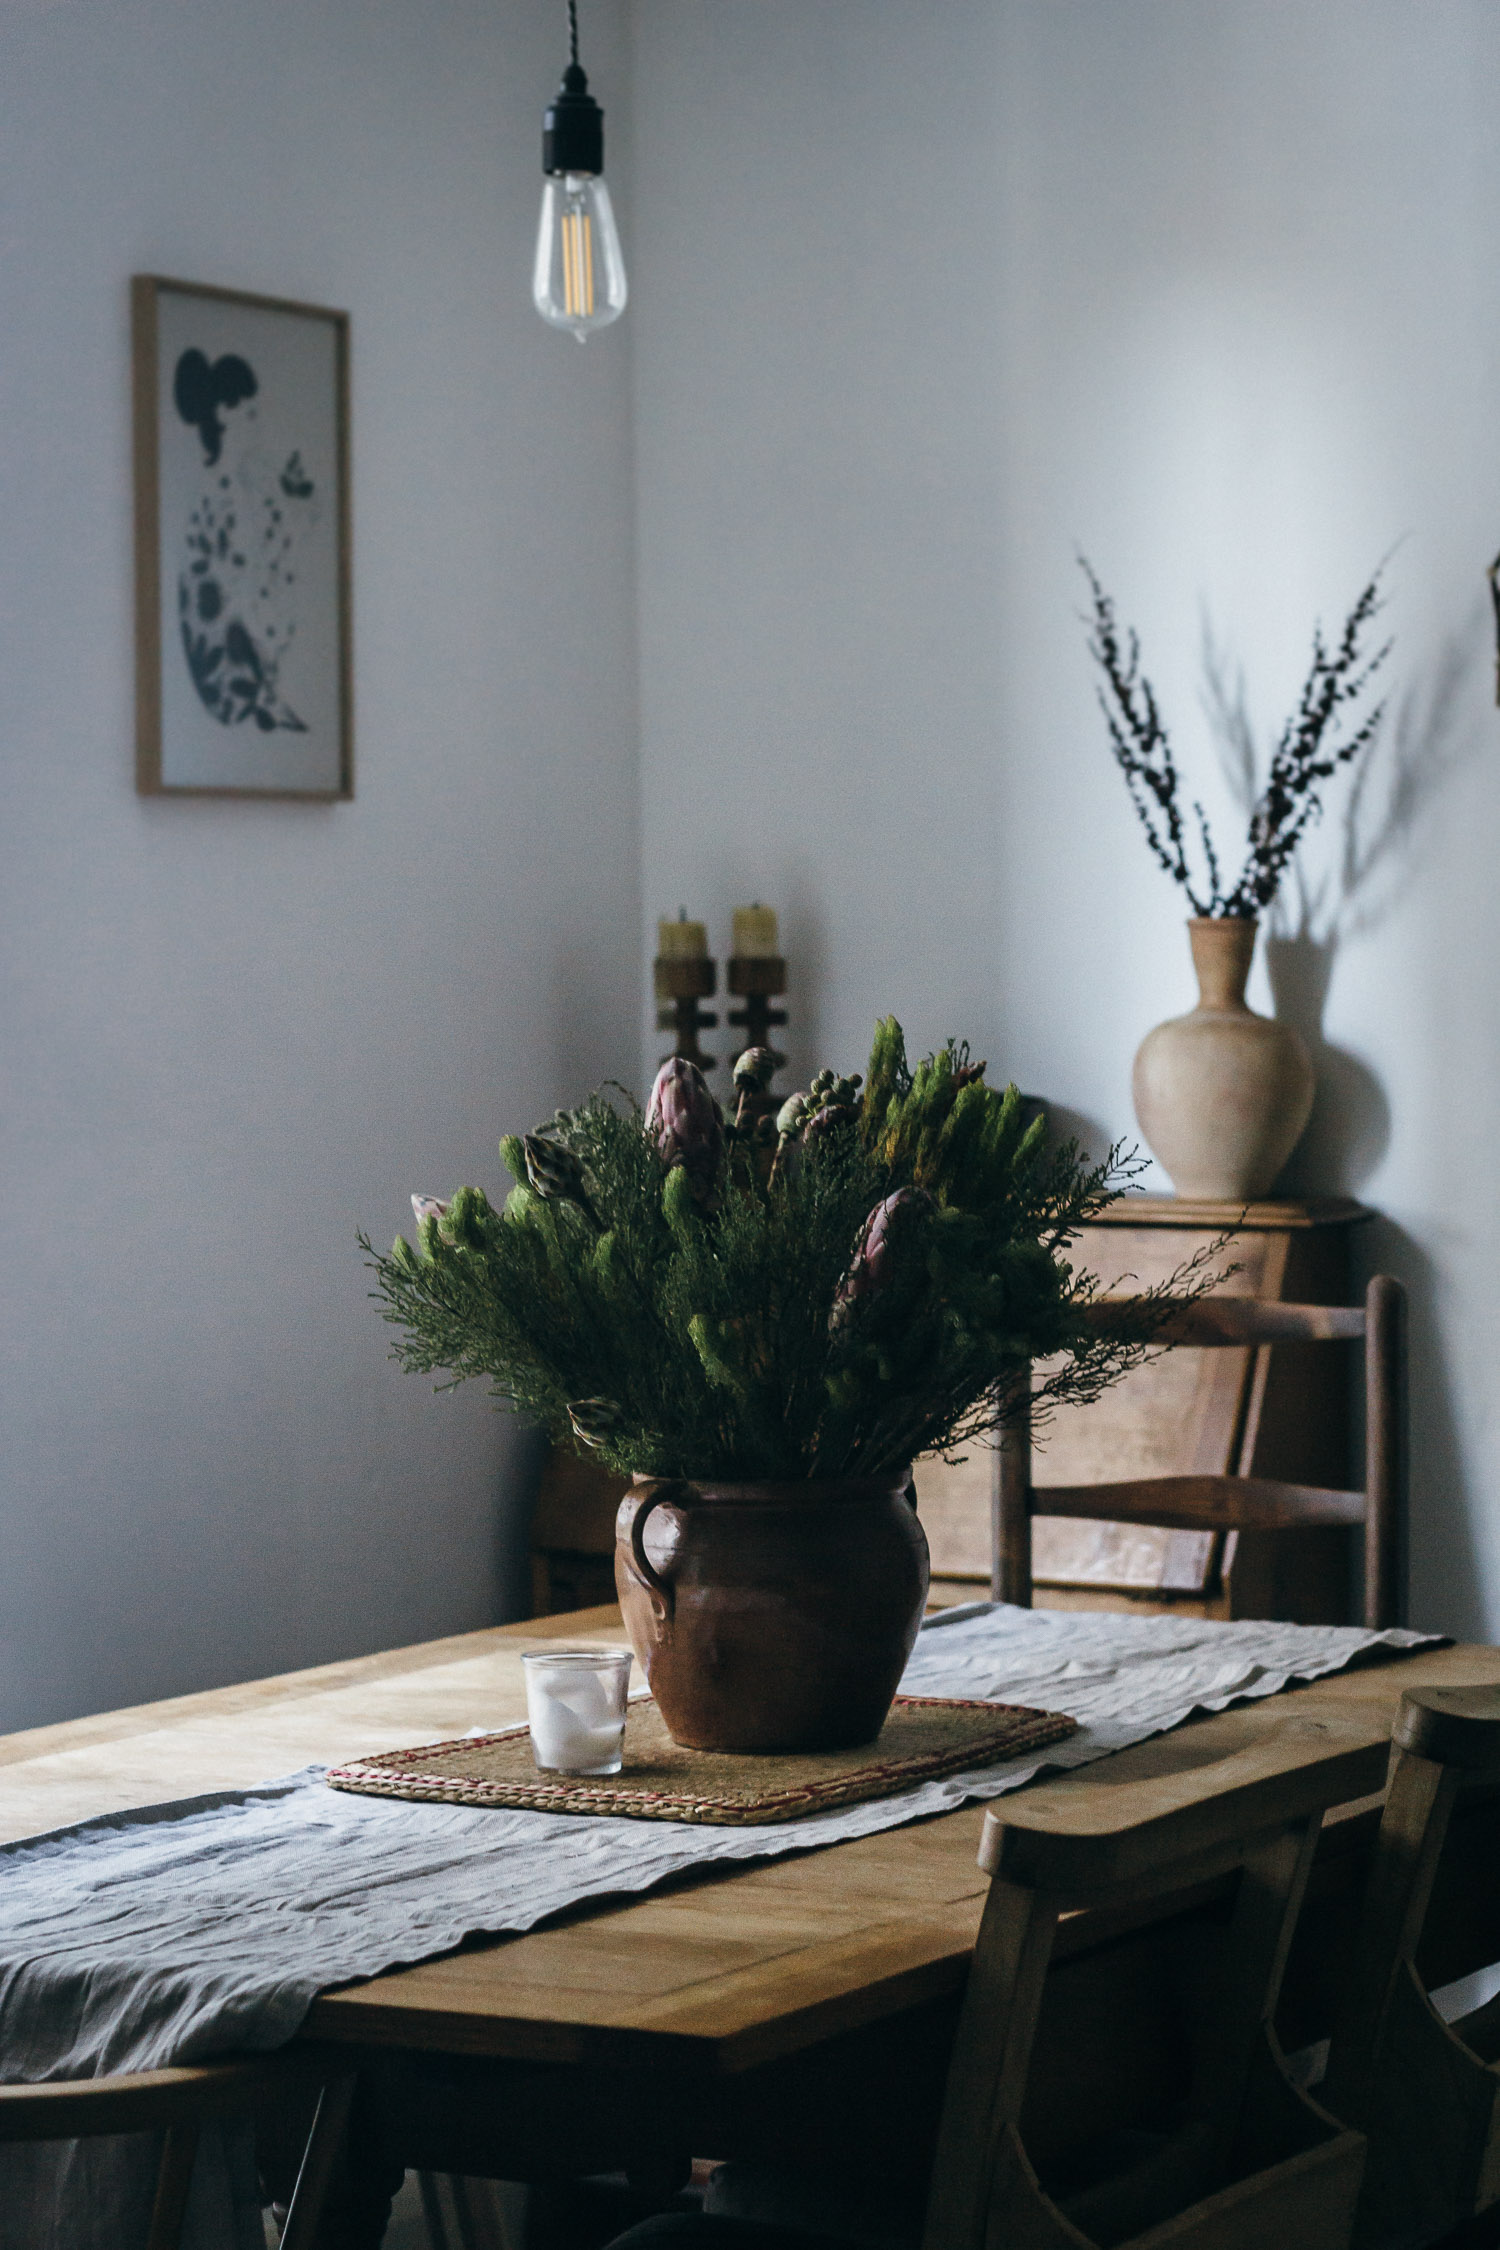 Restoration reveal. Restored family kitchen table.